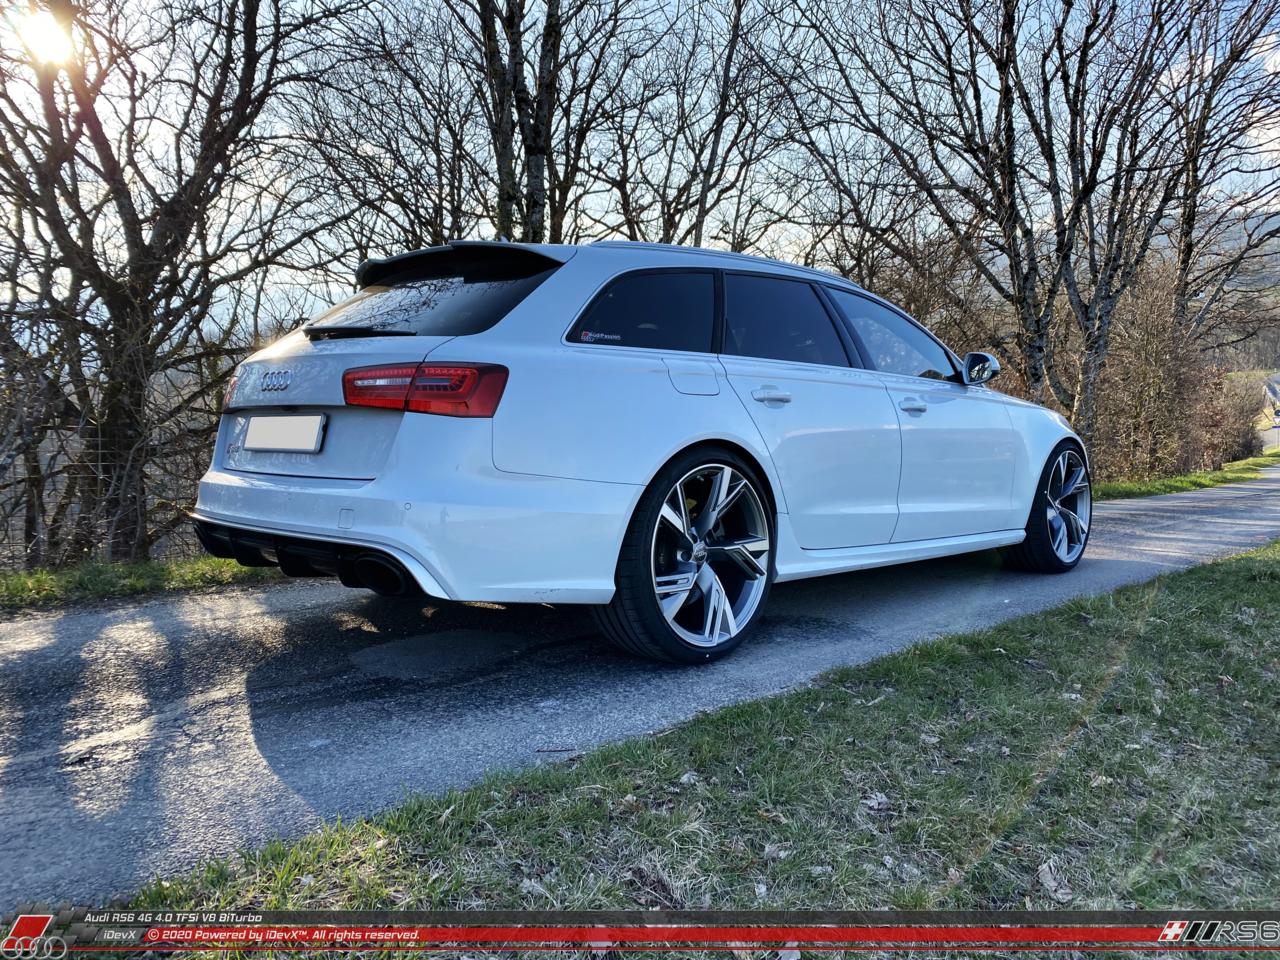 18.03.2020_Audi-RS6_iDevX_008.png